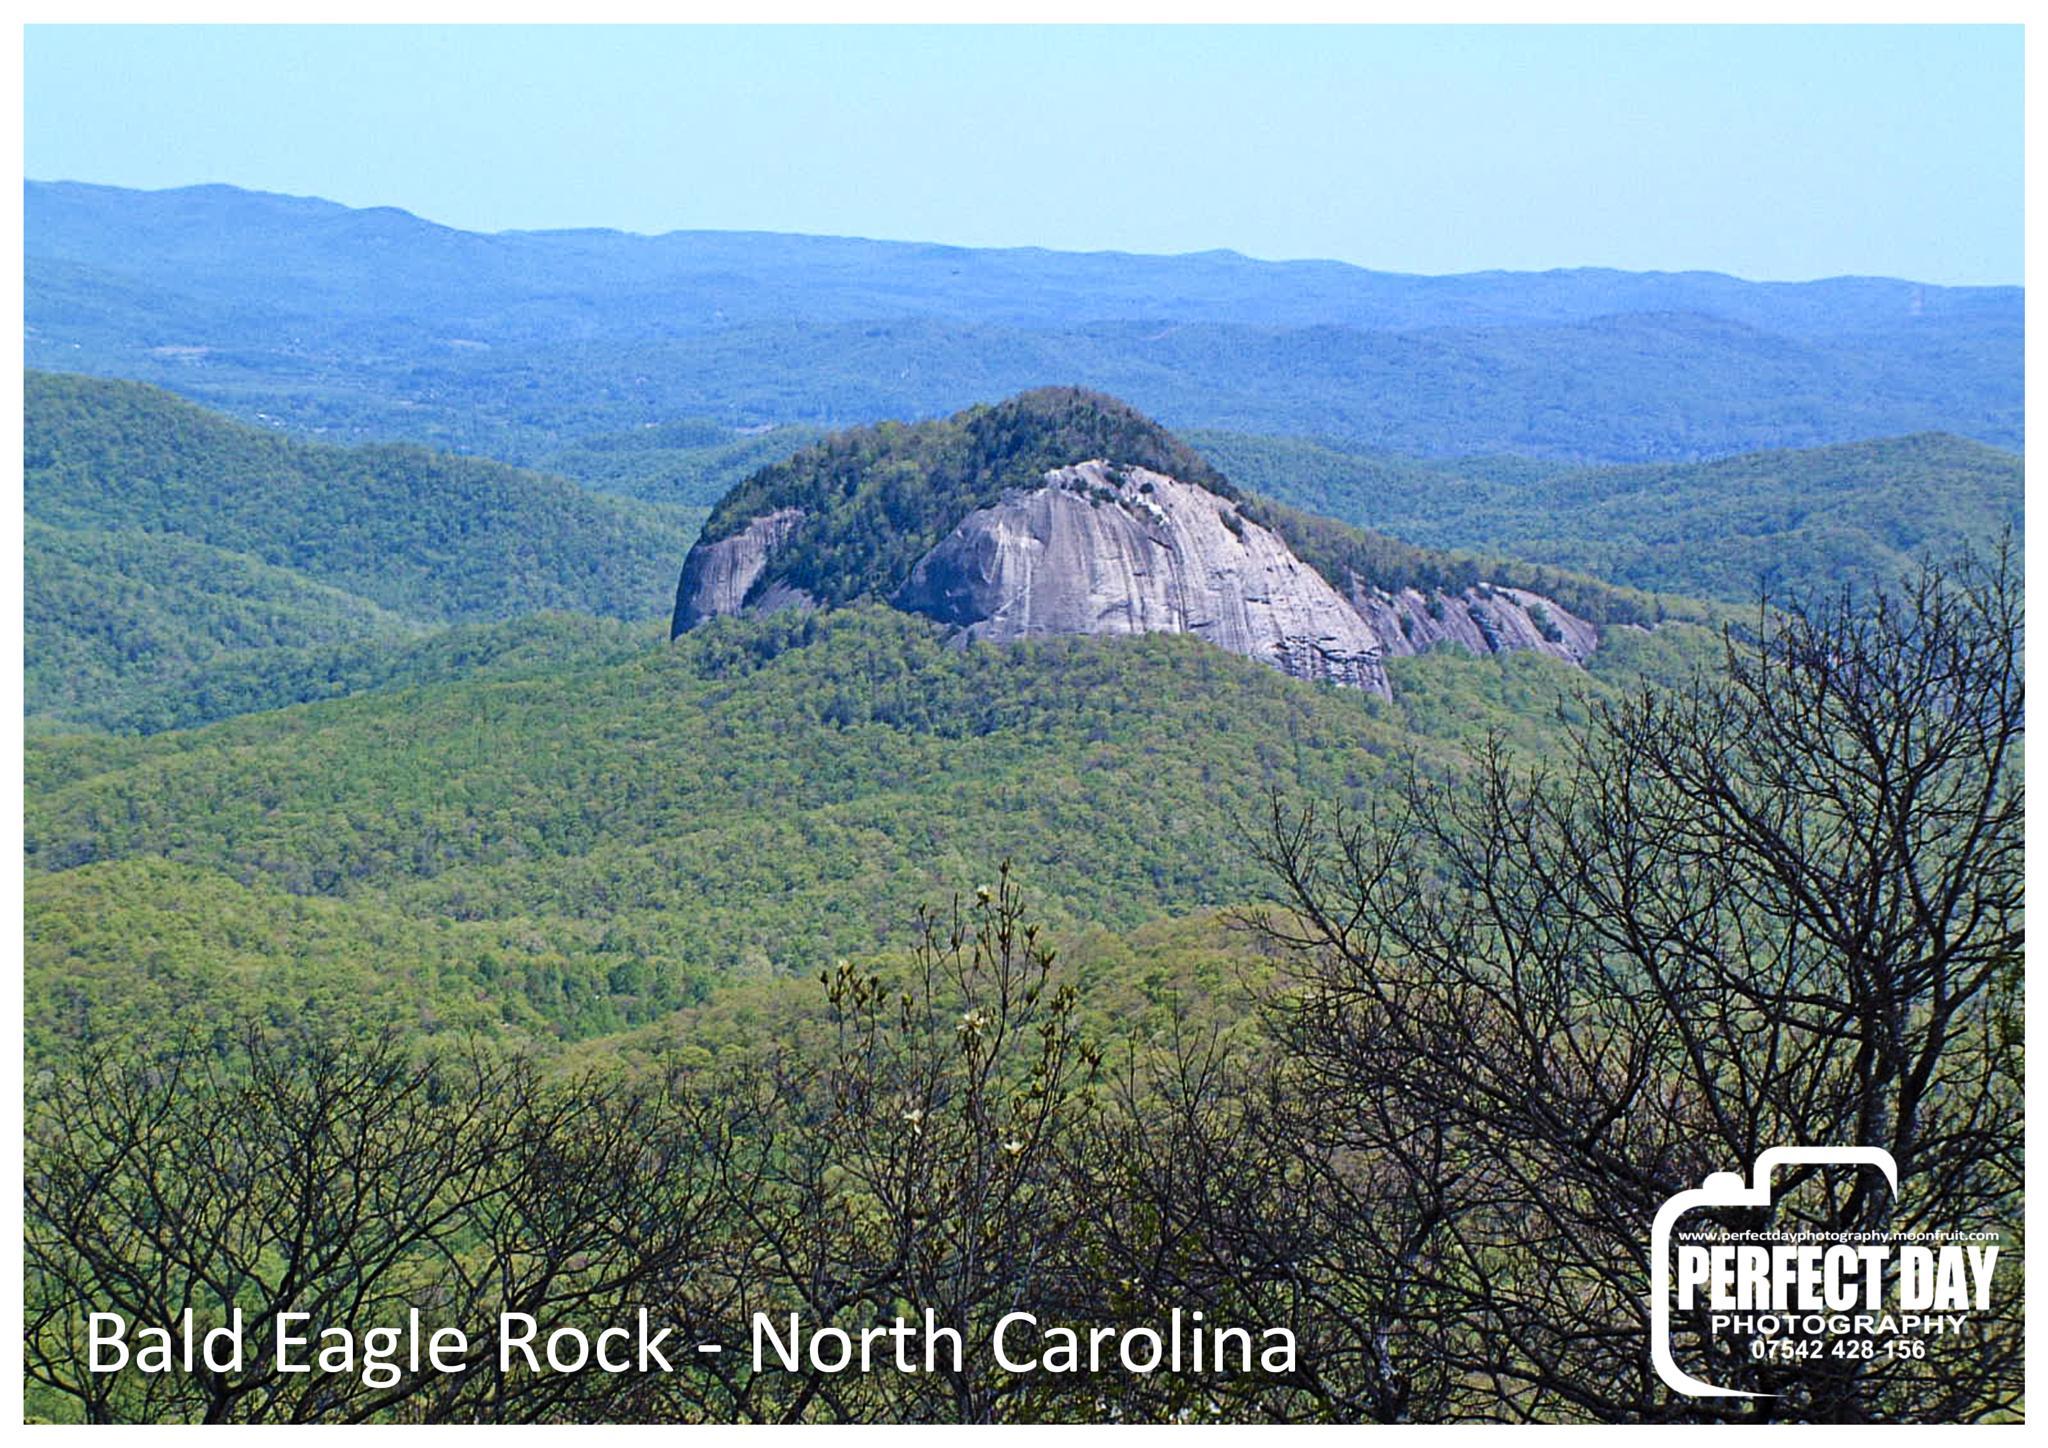 Bald Eagle Rock - Blue Ridge Mountains - N Carolina by mel.harrison.5439